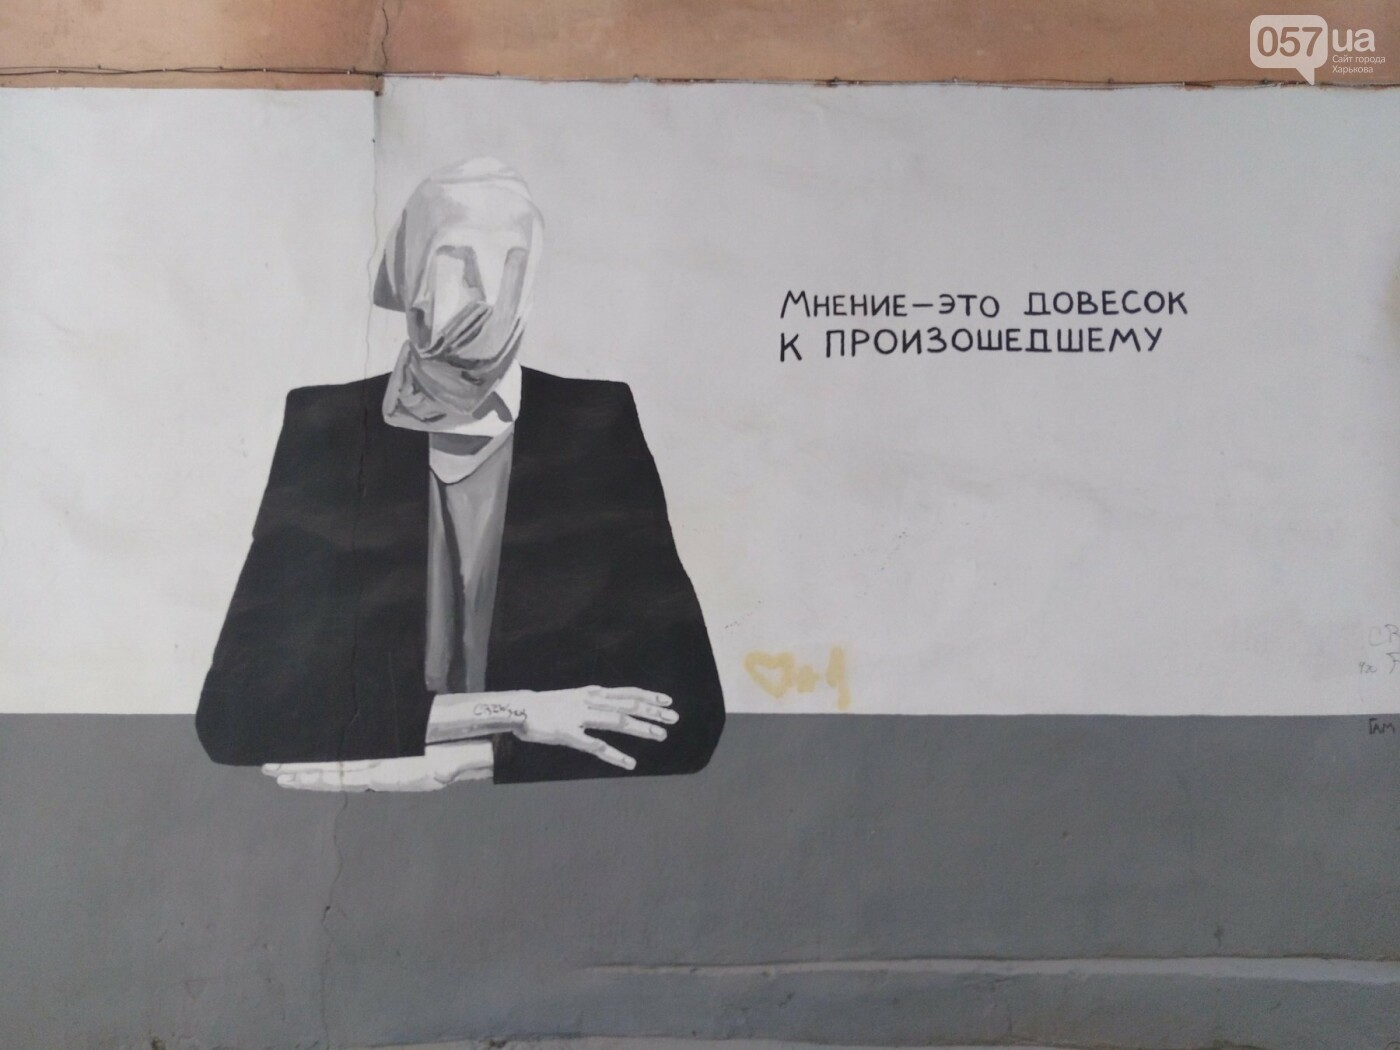 Стрит-арт Гамлета в Харькове: ТОП-10 граффити художника, - ФОТО, фото-7